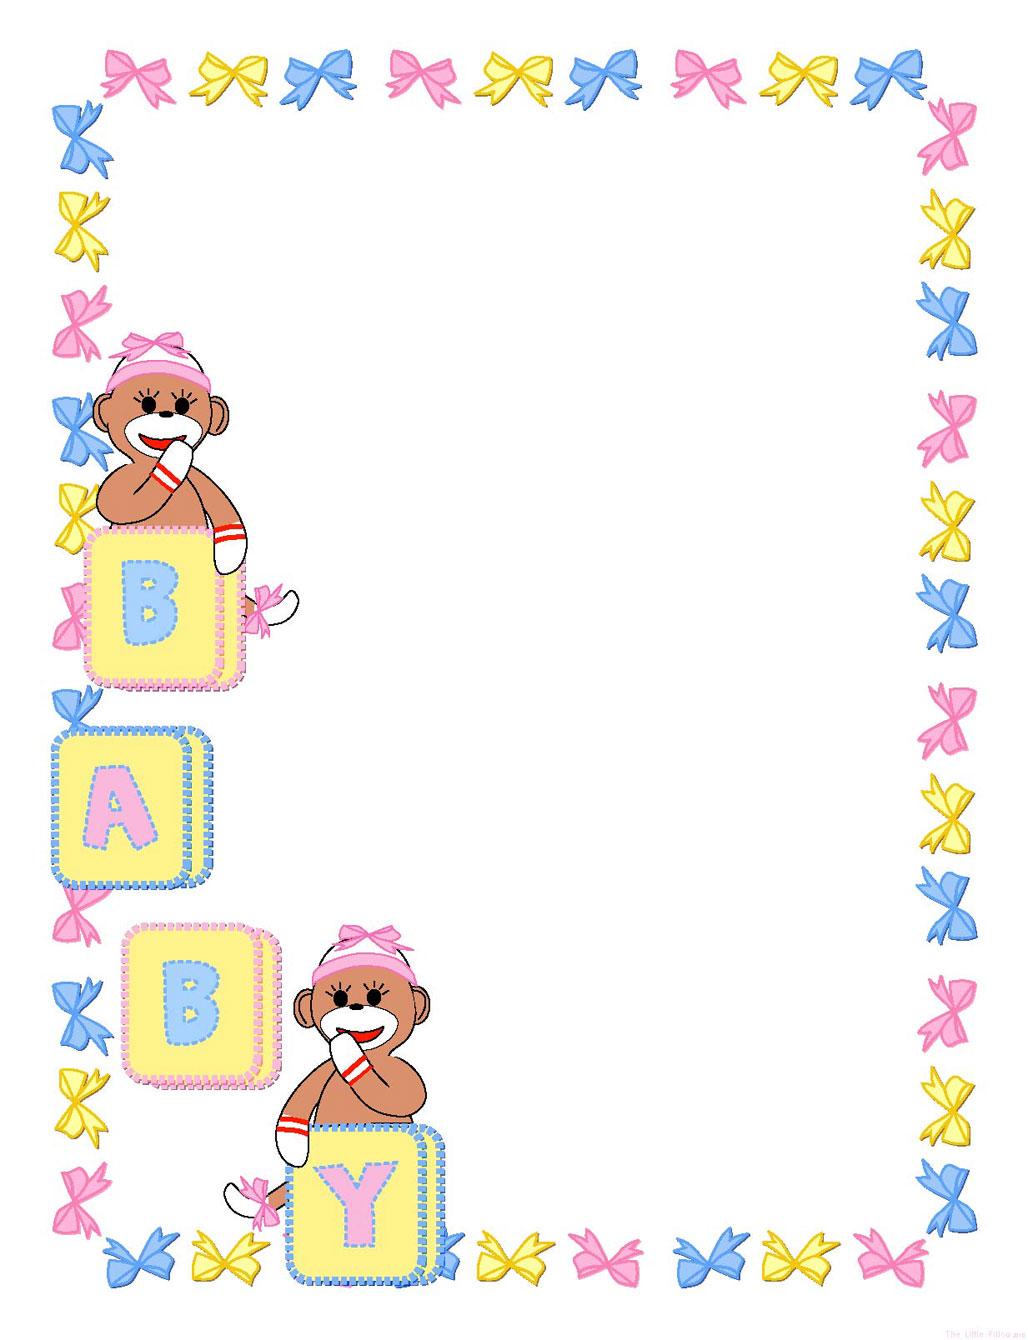 Baby girl clipart border vector royalty free download Baby Border Clipart - Clipart Kid vector royalty free download